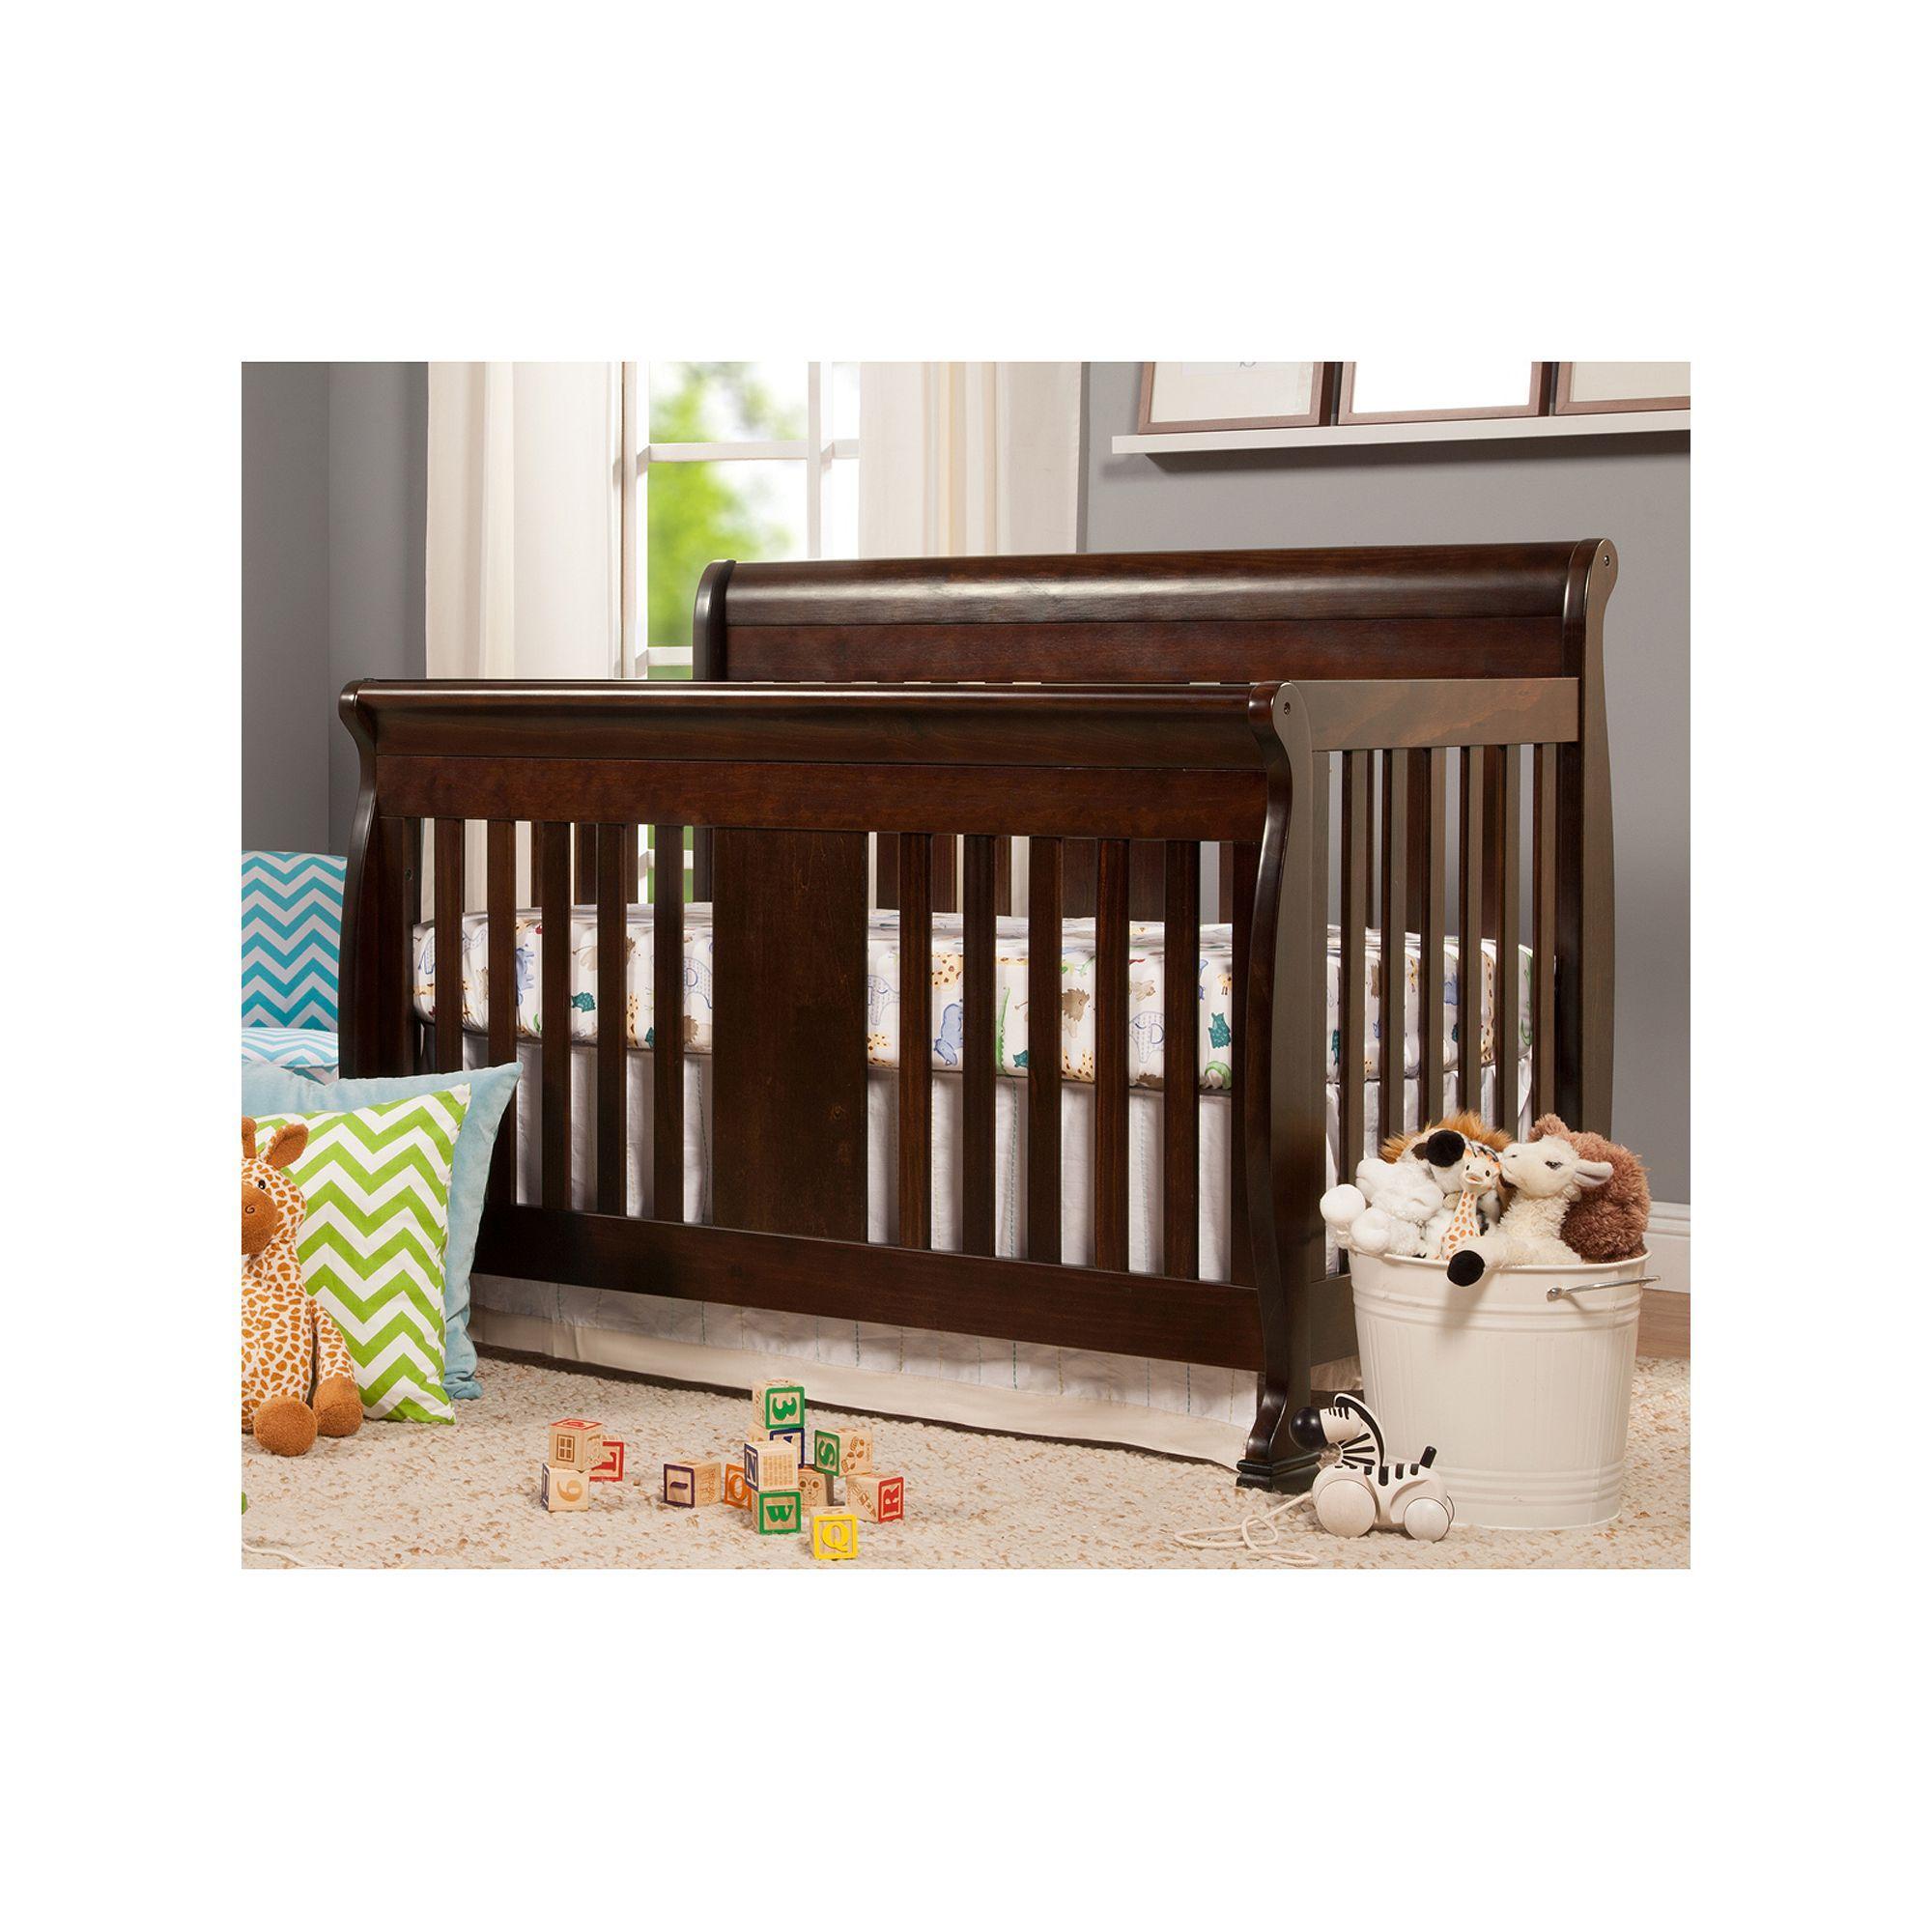 Davinci Porter 4 In 1 Convertible Crib Brown Convertible Crib